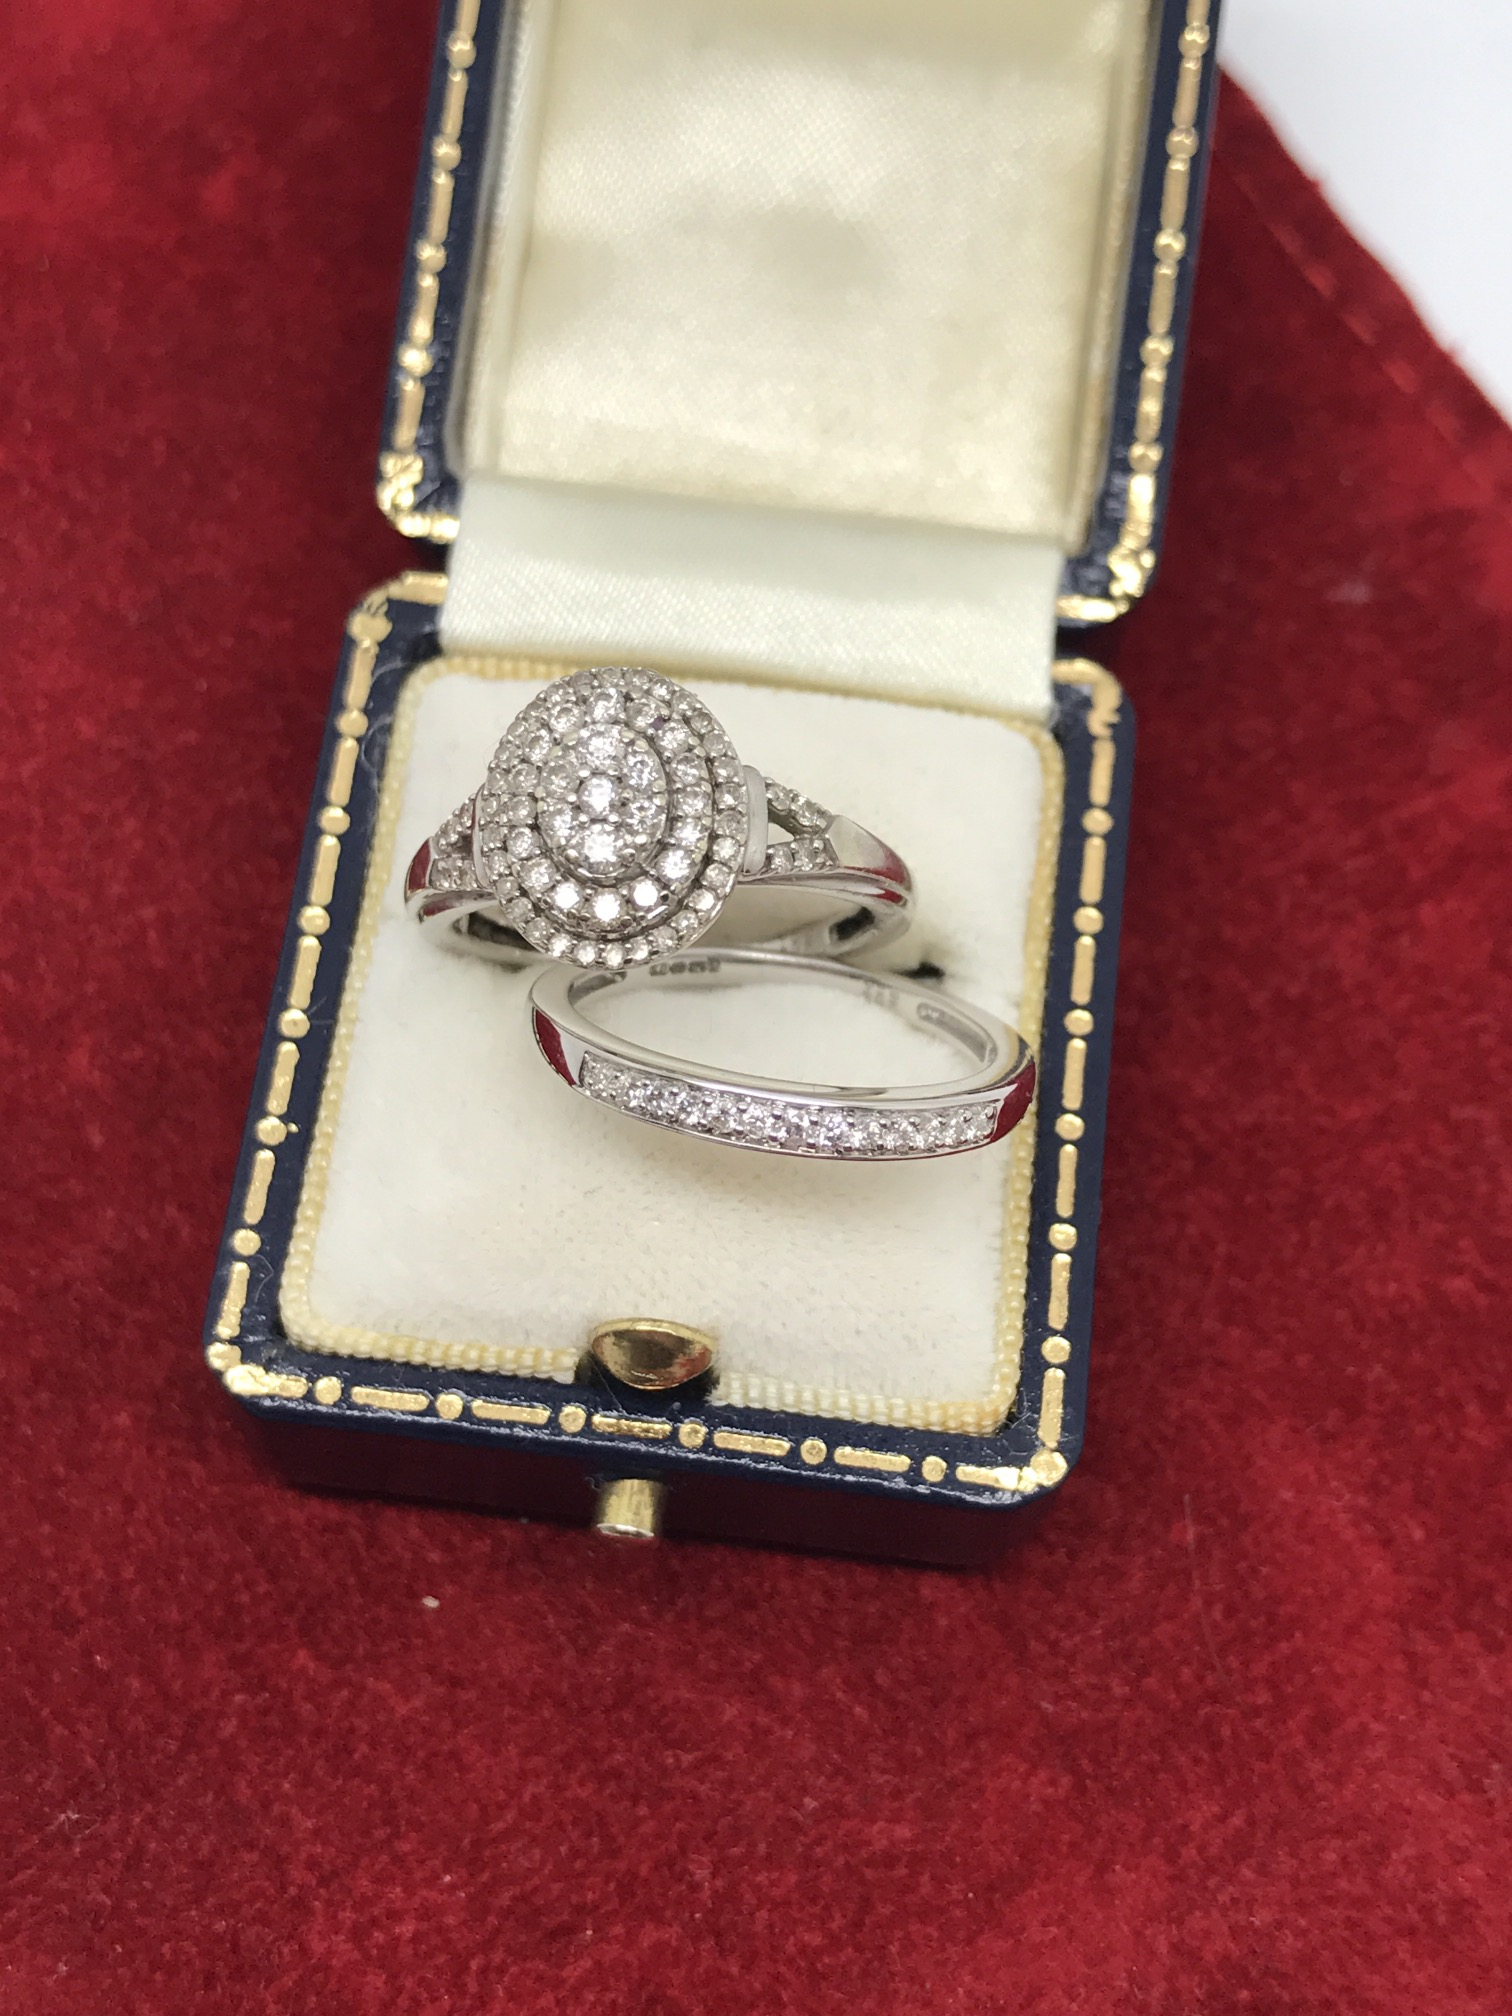 Lot 38 - 9ct WHITE GOLD DIAMOND ENGAGEMENT RING & 9ct GOLD DIA SET BAND RING